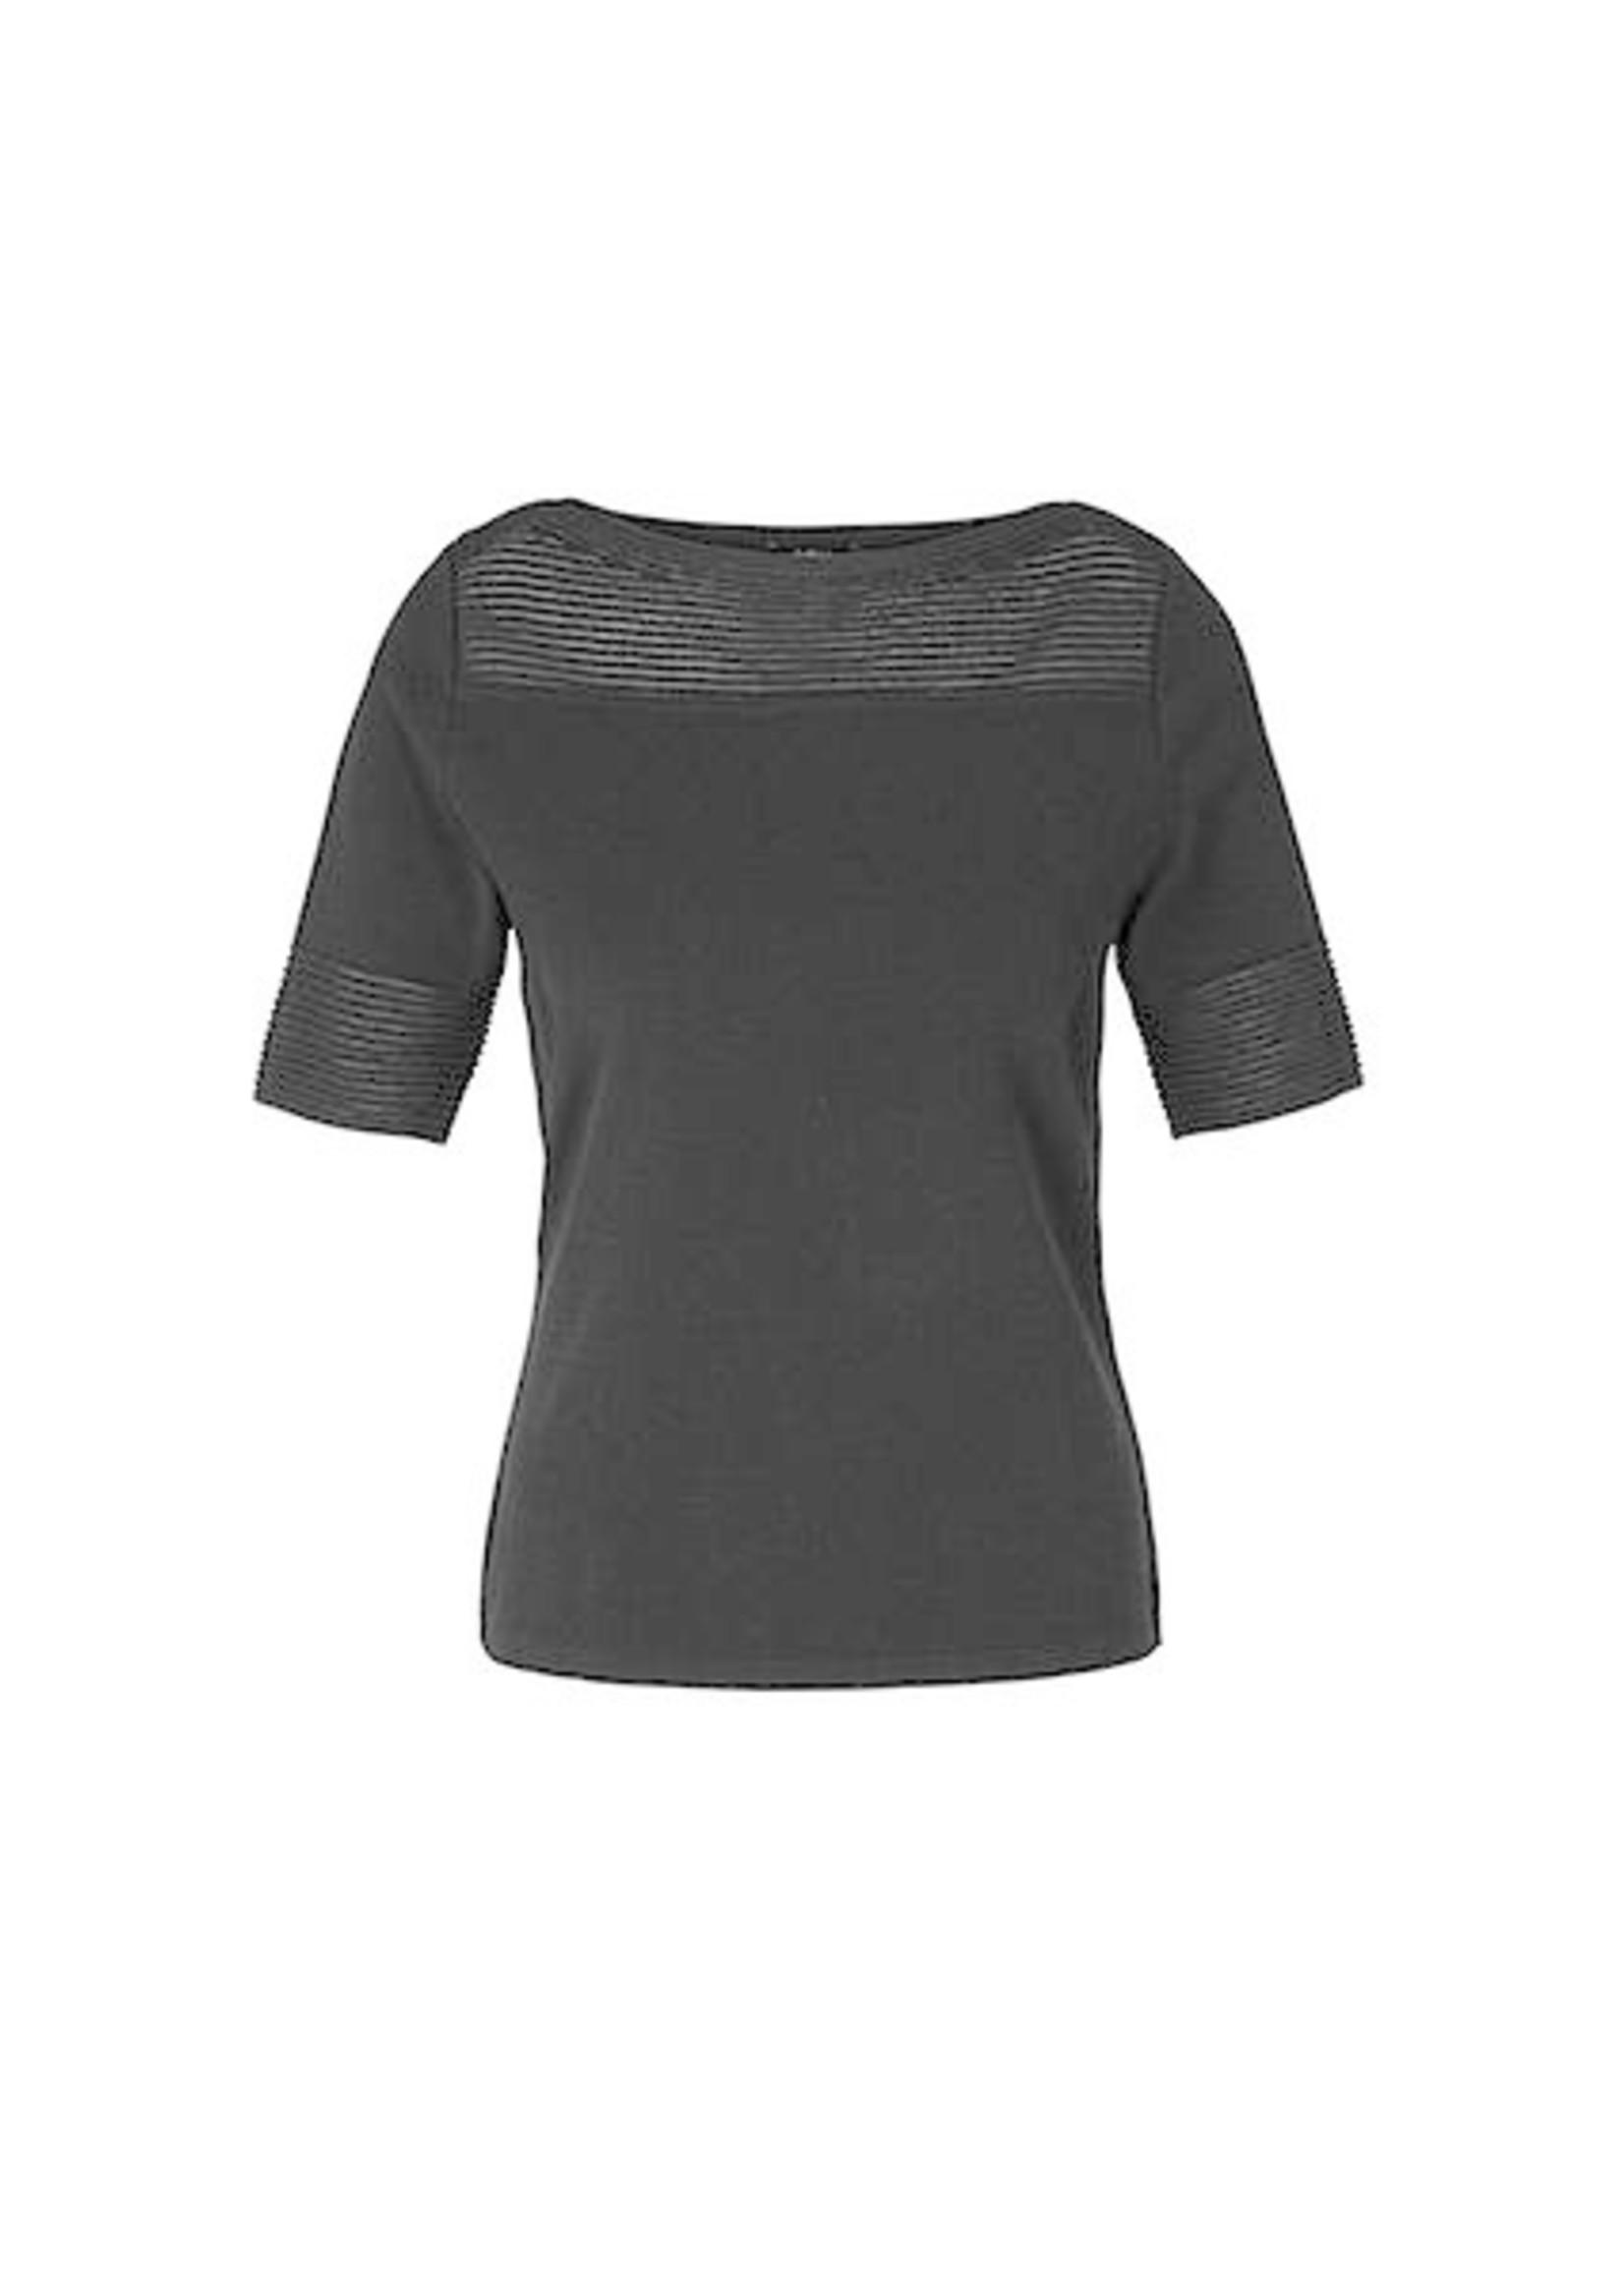 Sweater RC 41.14 M39 black